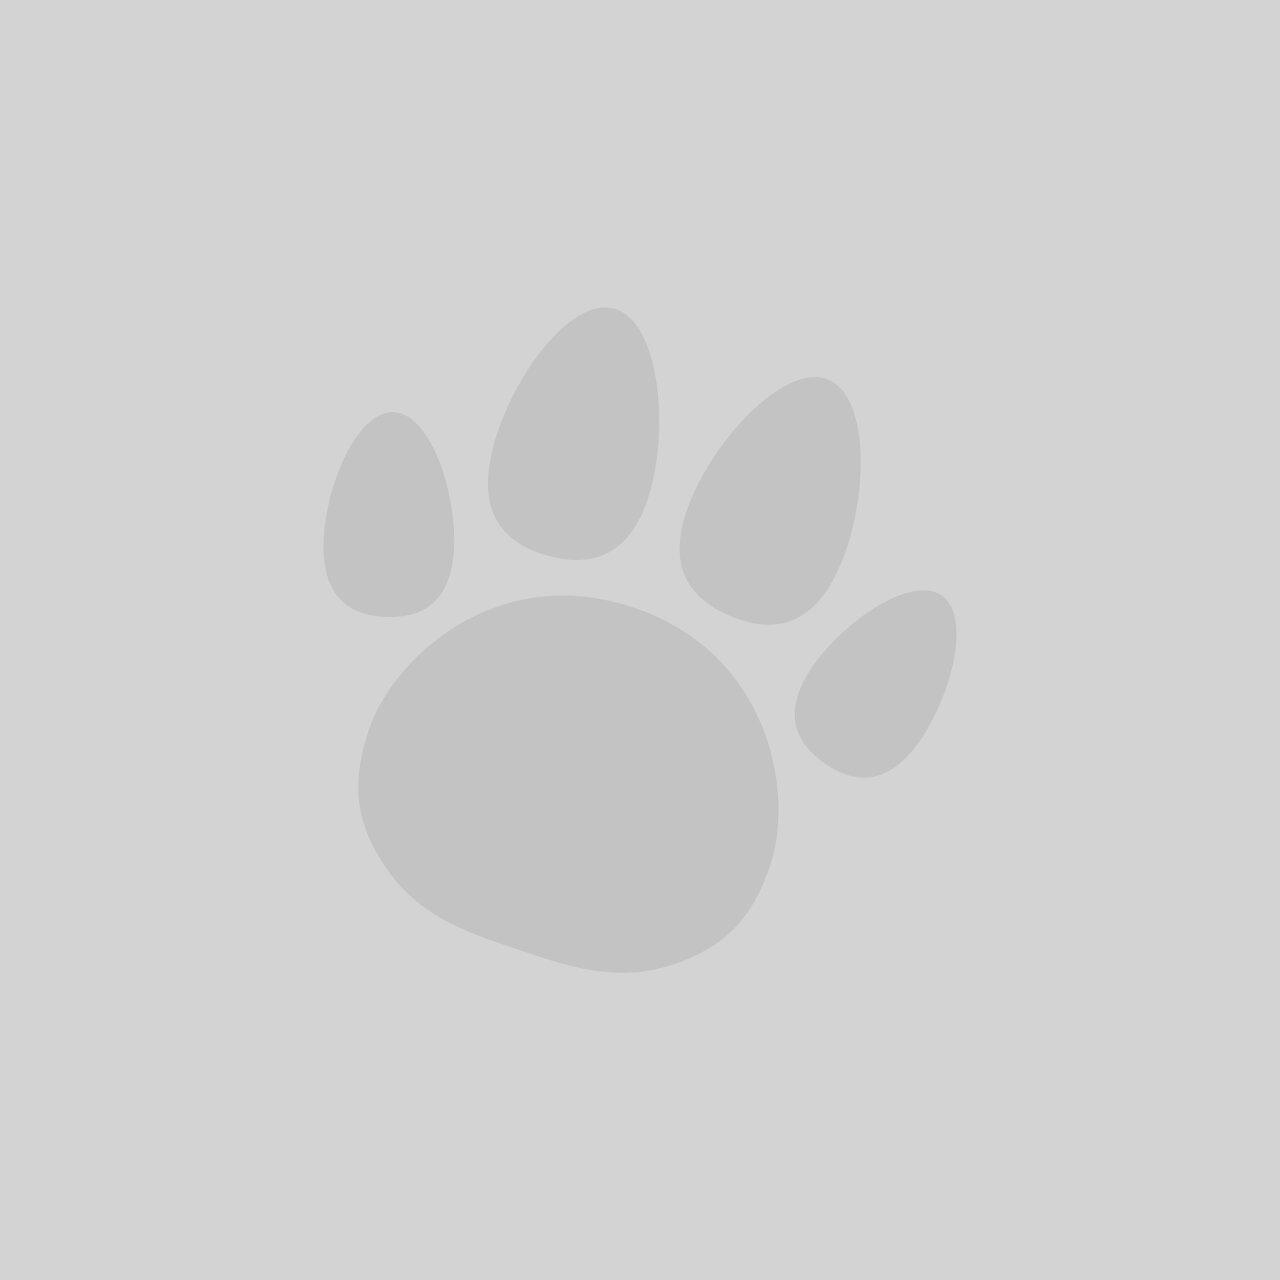 Sonny Classic Graphite Plastic Dog Bed 65cm